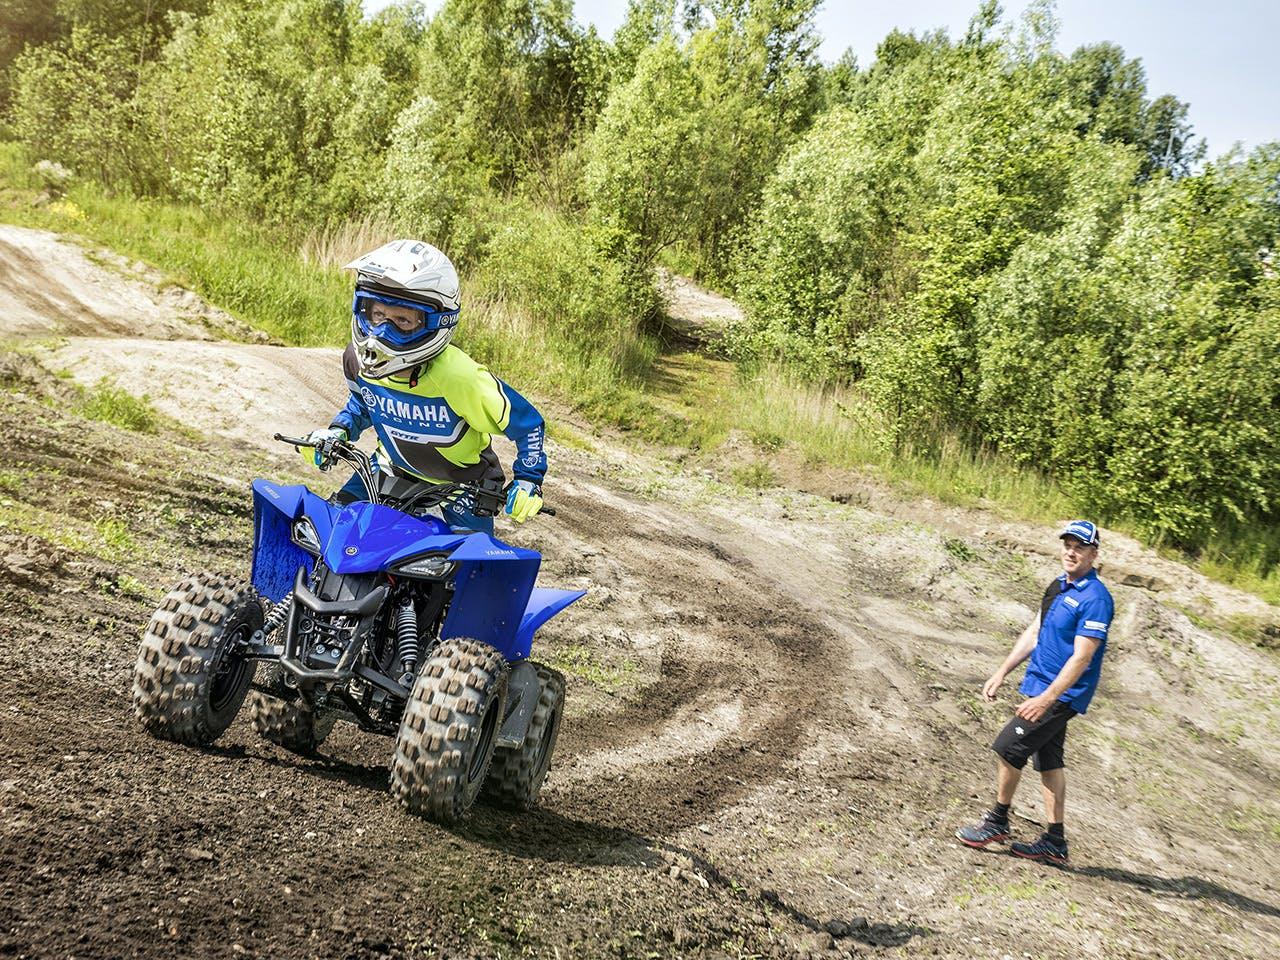 Yamaha YFZ50 in team yamaha blue colour, being ridden off-track